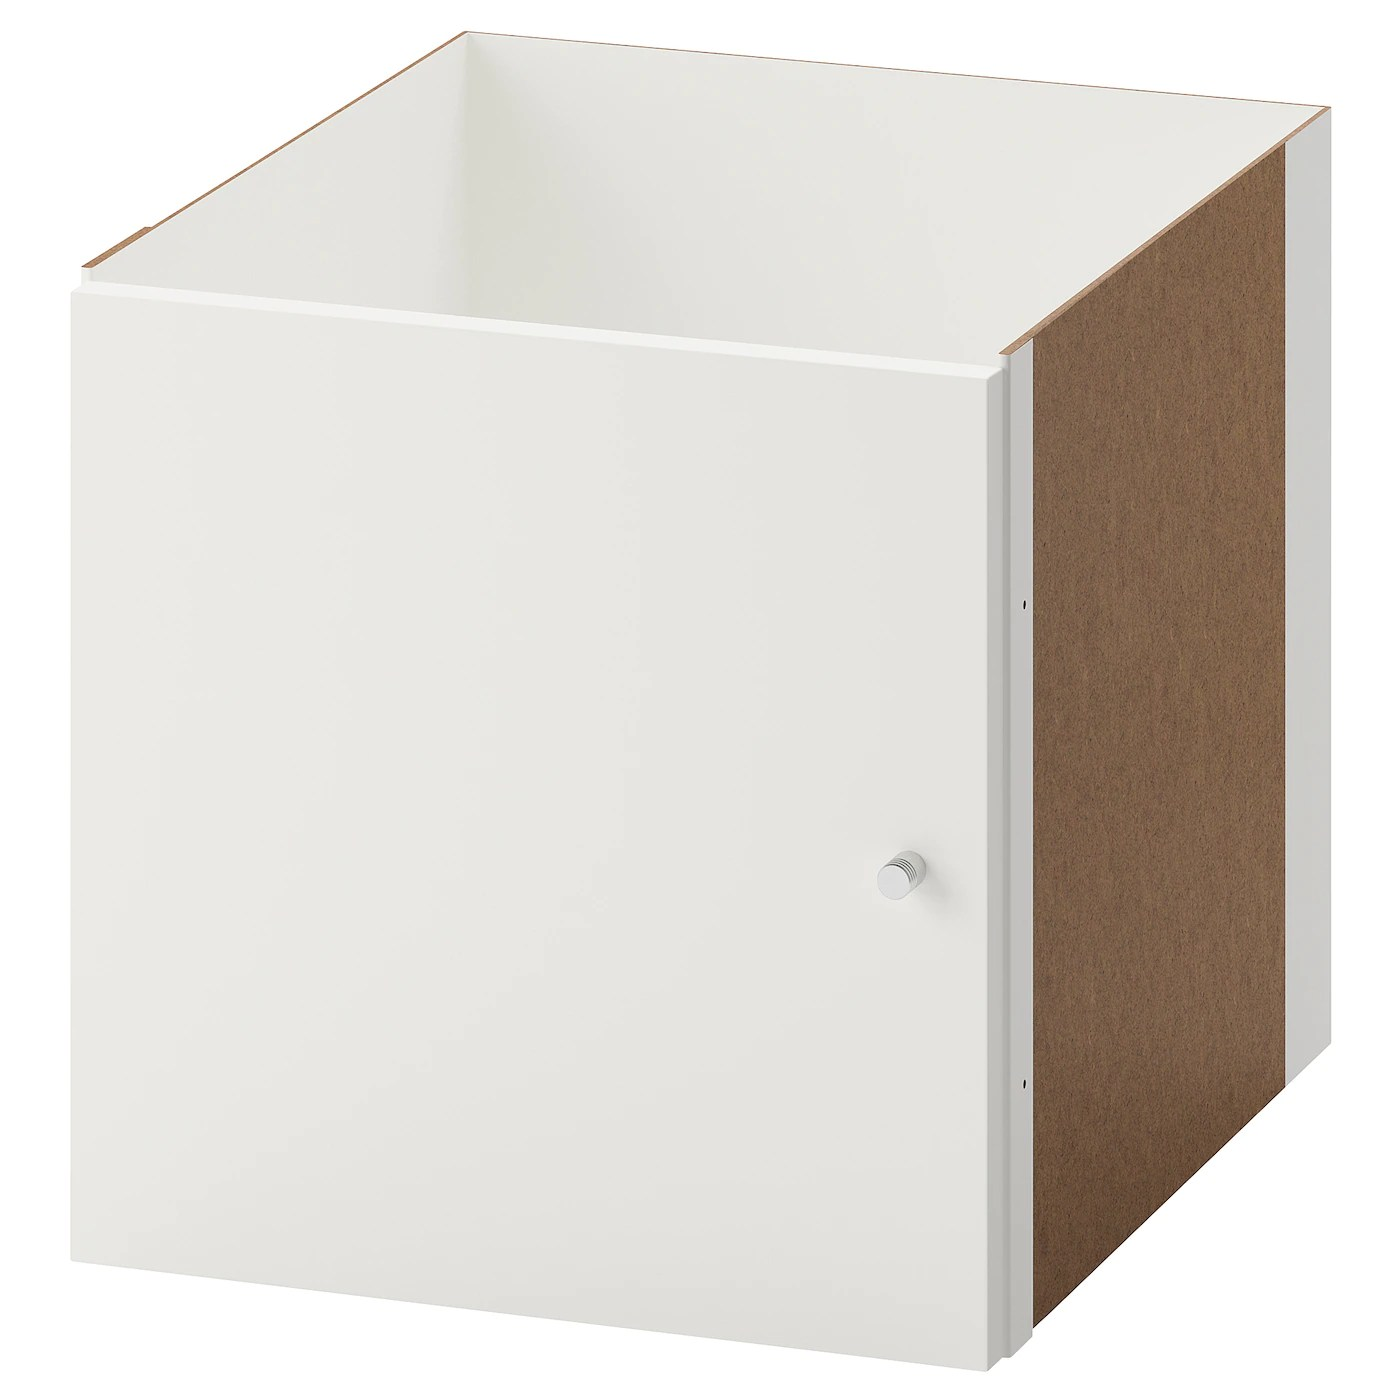 Kallax Bloc Porte Blanc 33x33 Cm Ikea